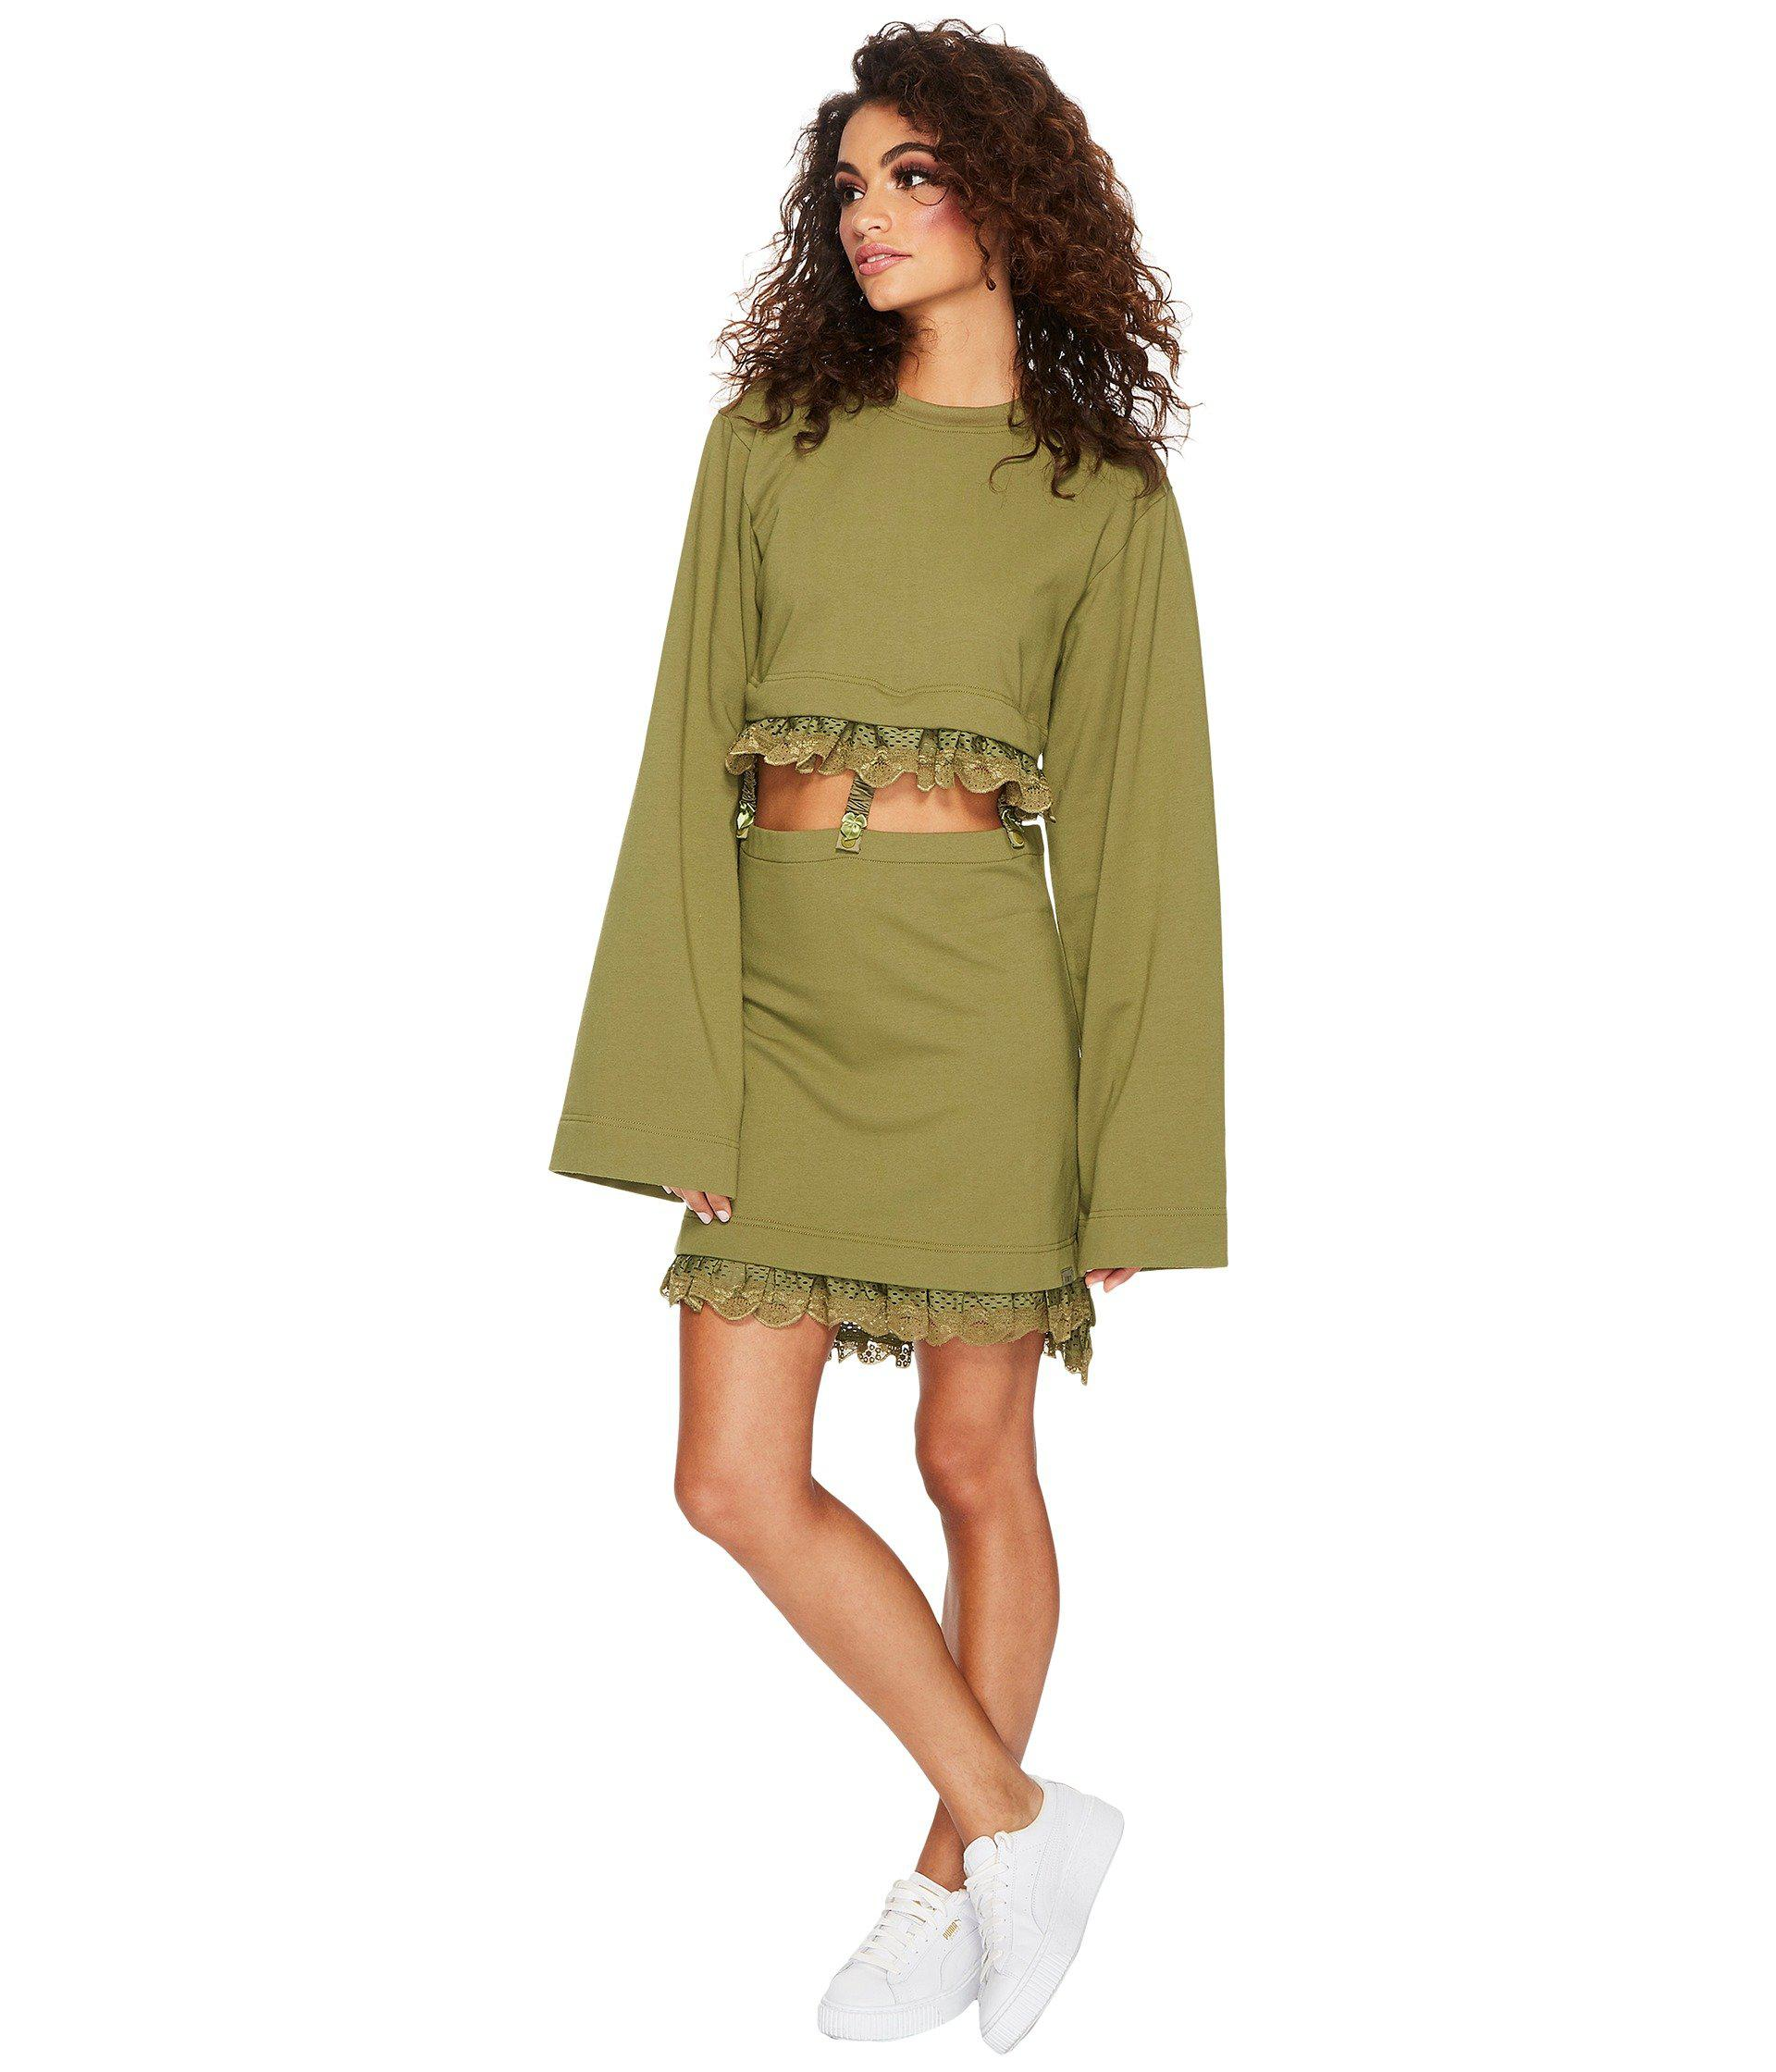 9e8c796428f6 Lyst - PUMA Fenty Kimono Sleeve T-shirt in Green